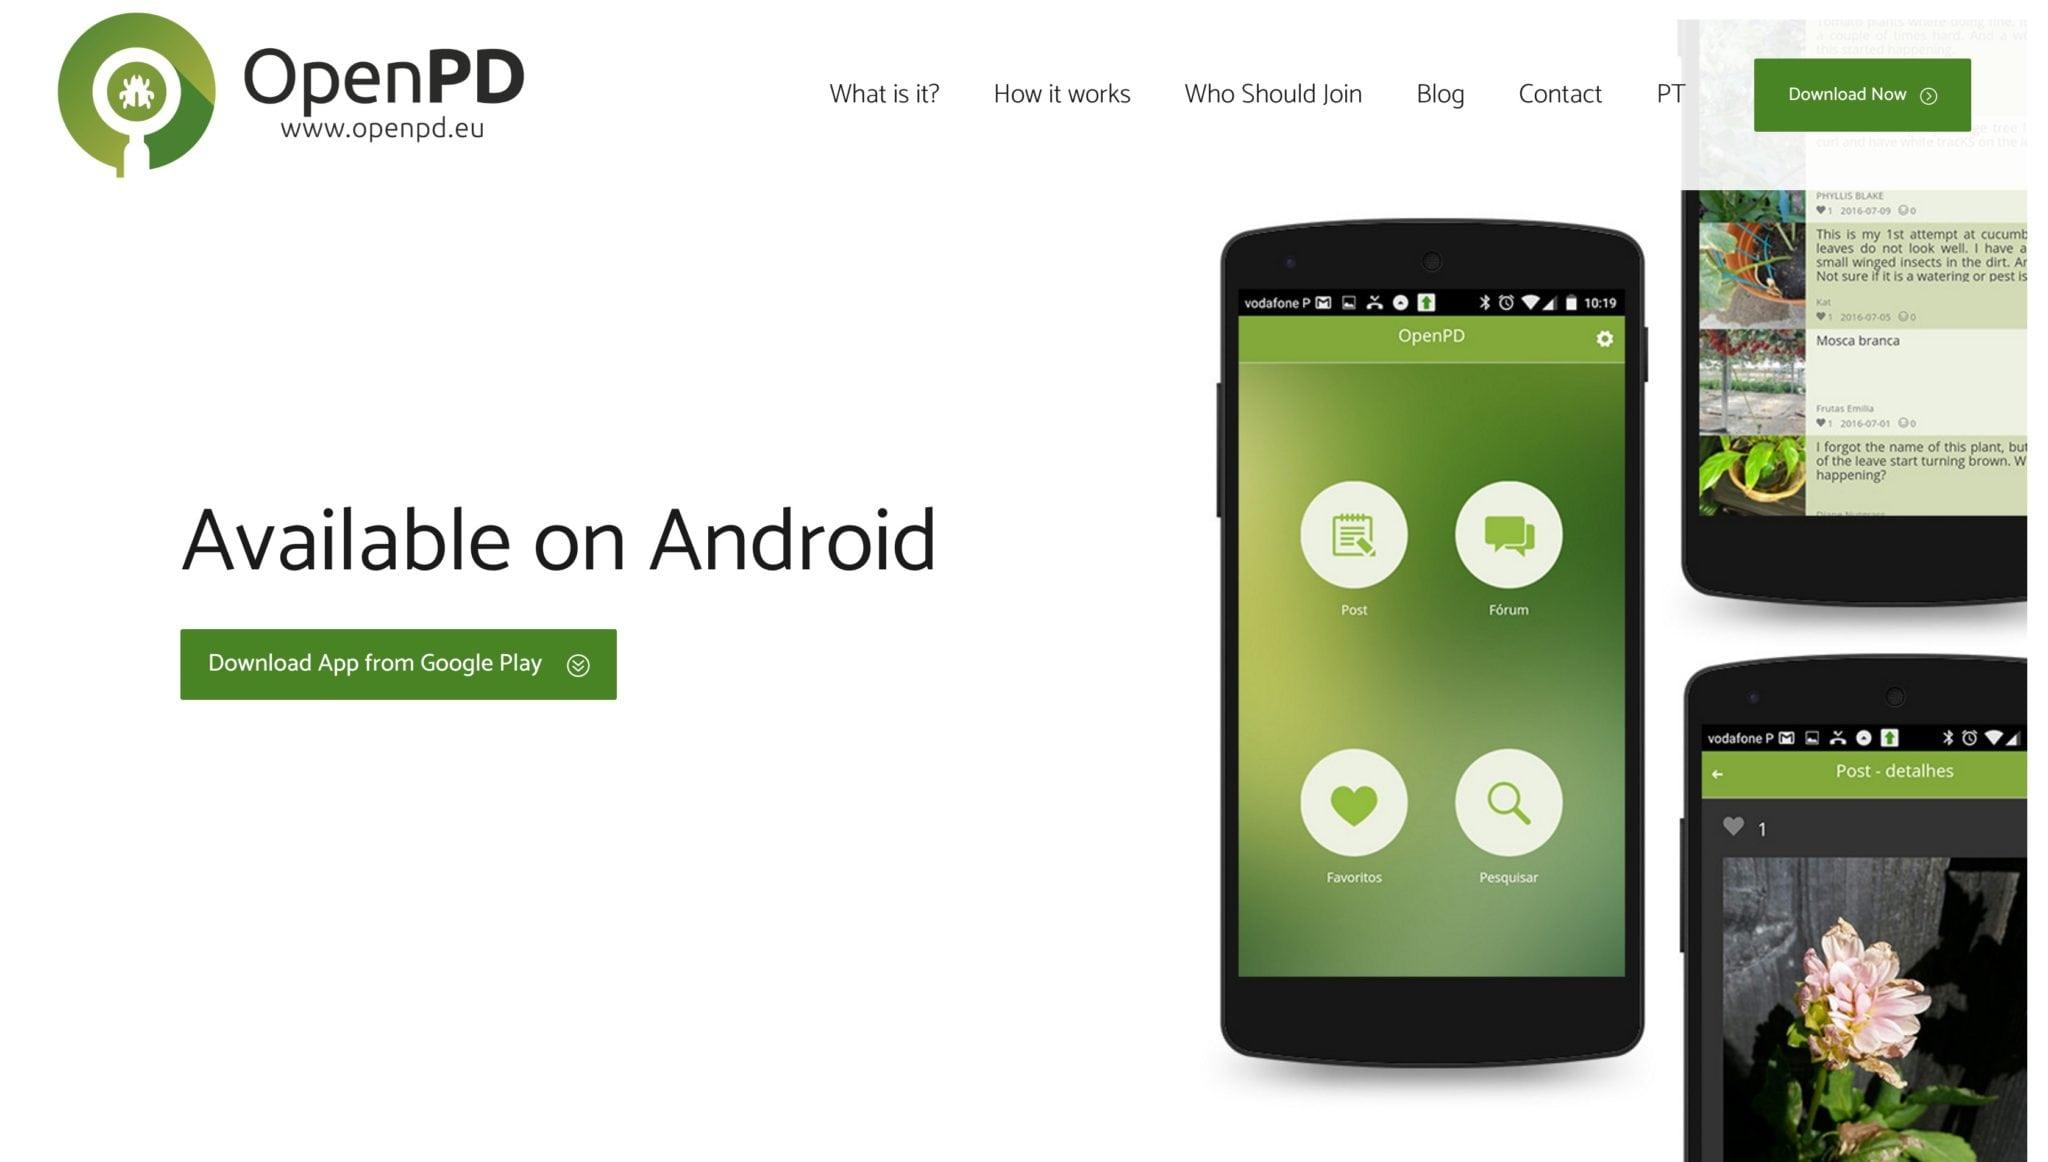 OpenPd website